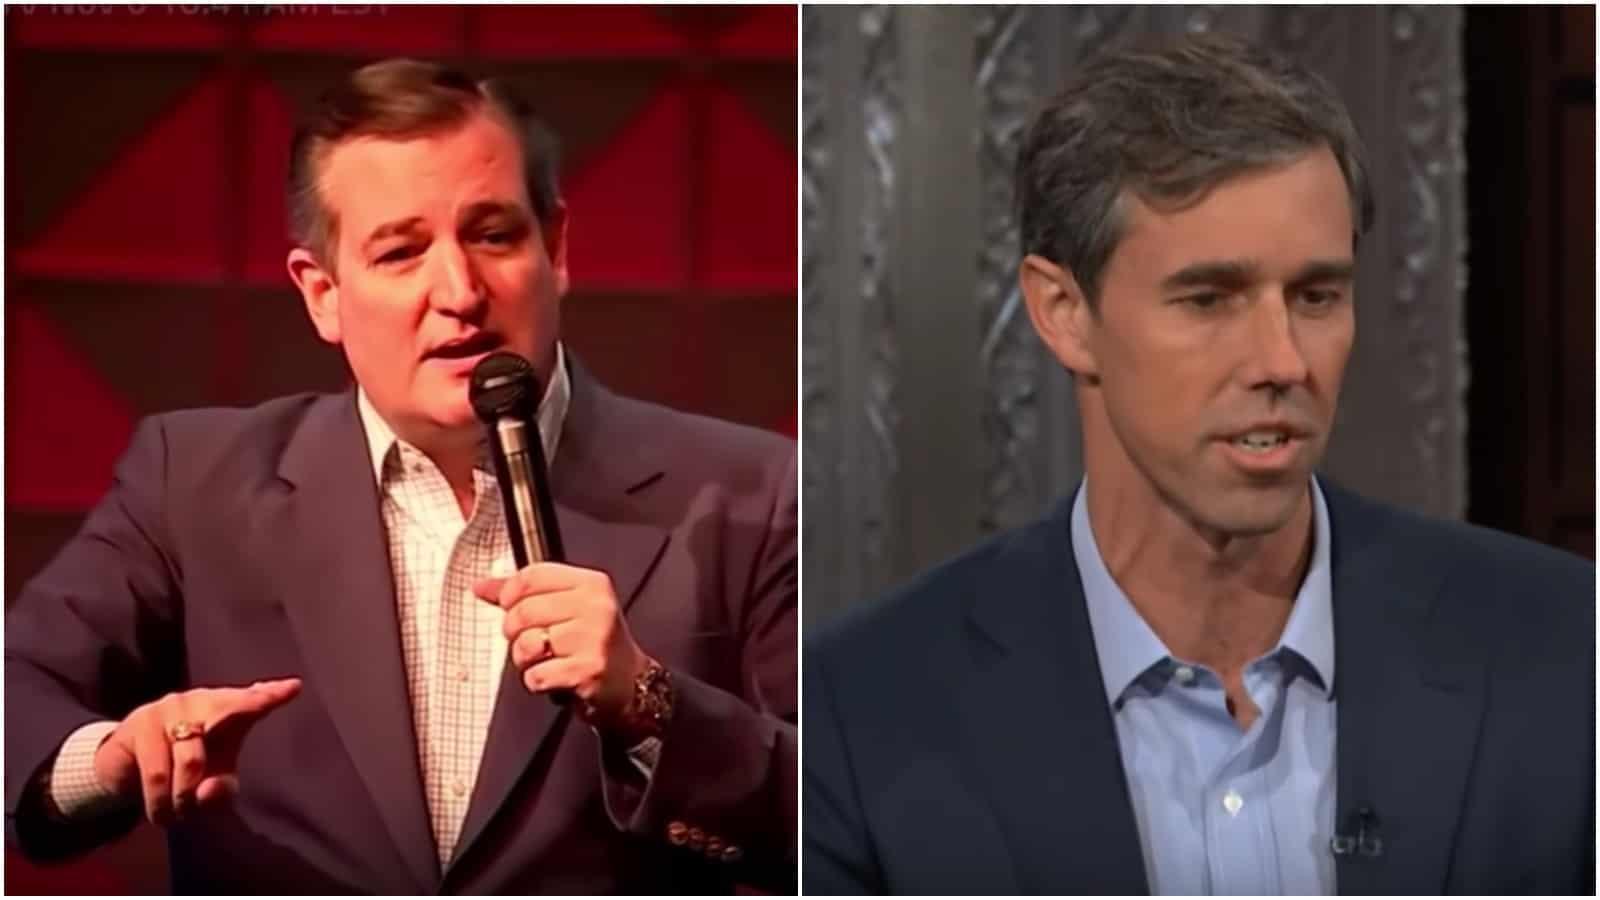 Ted Cruz, Beto O'Rourke, Texas, Senate